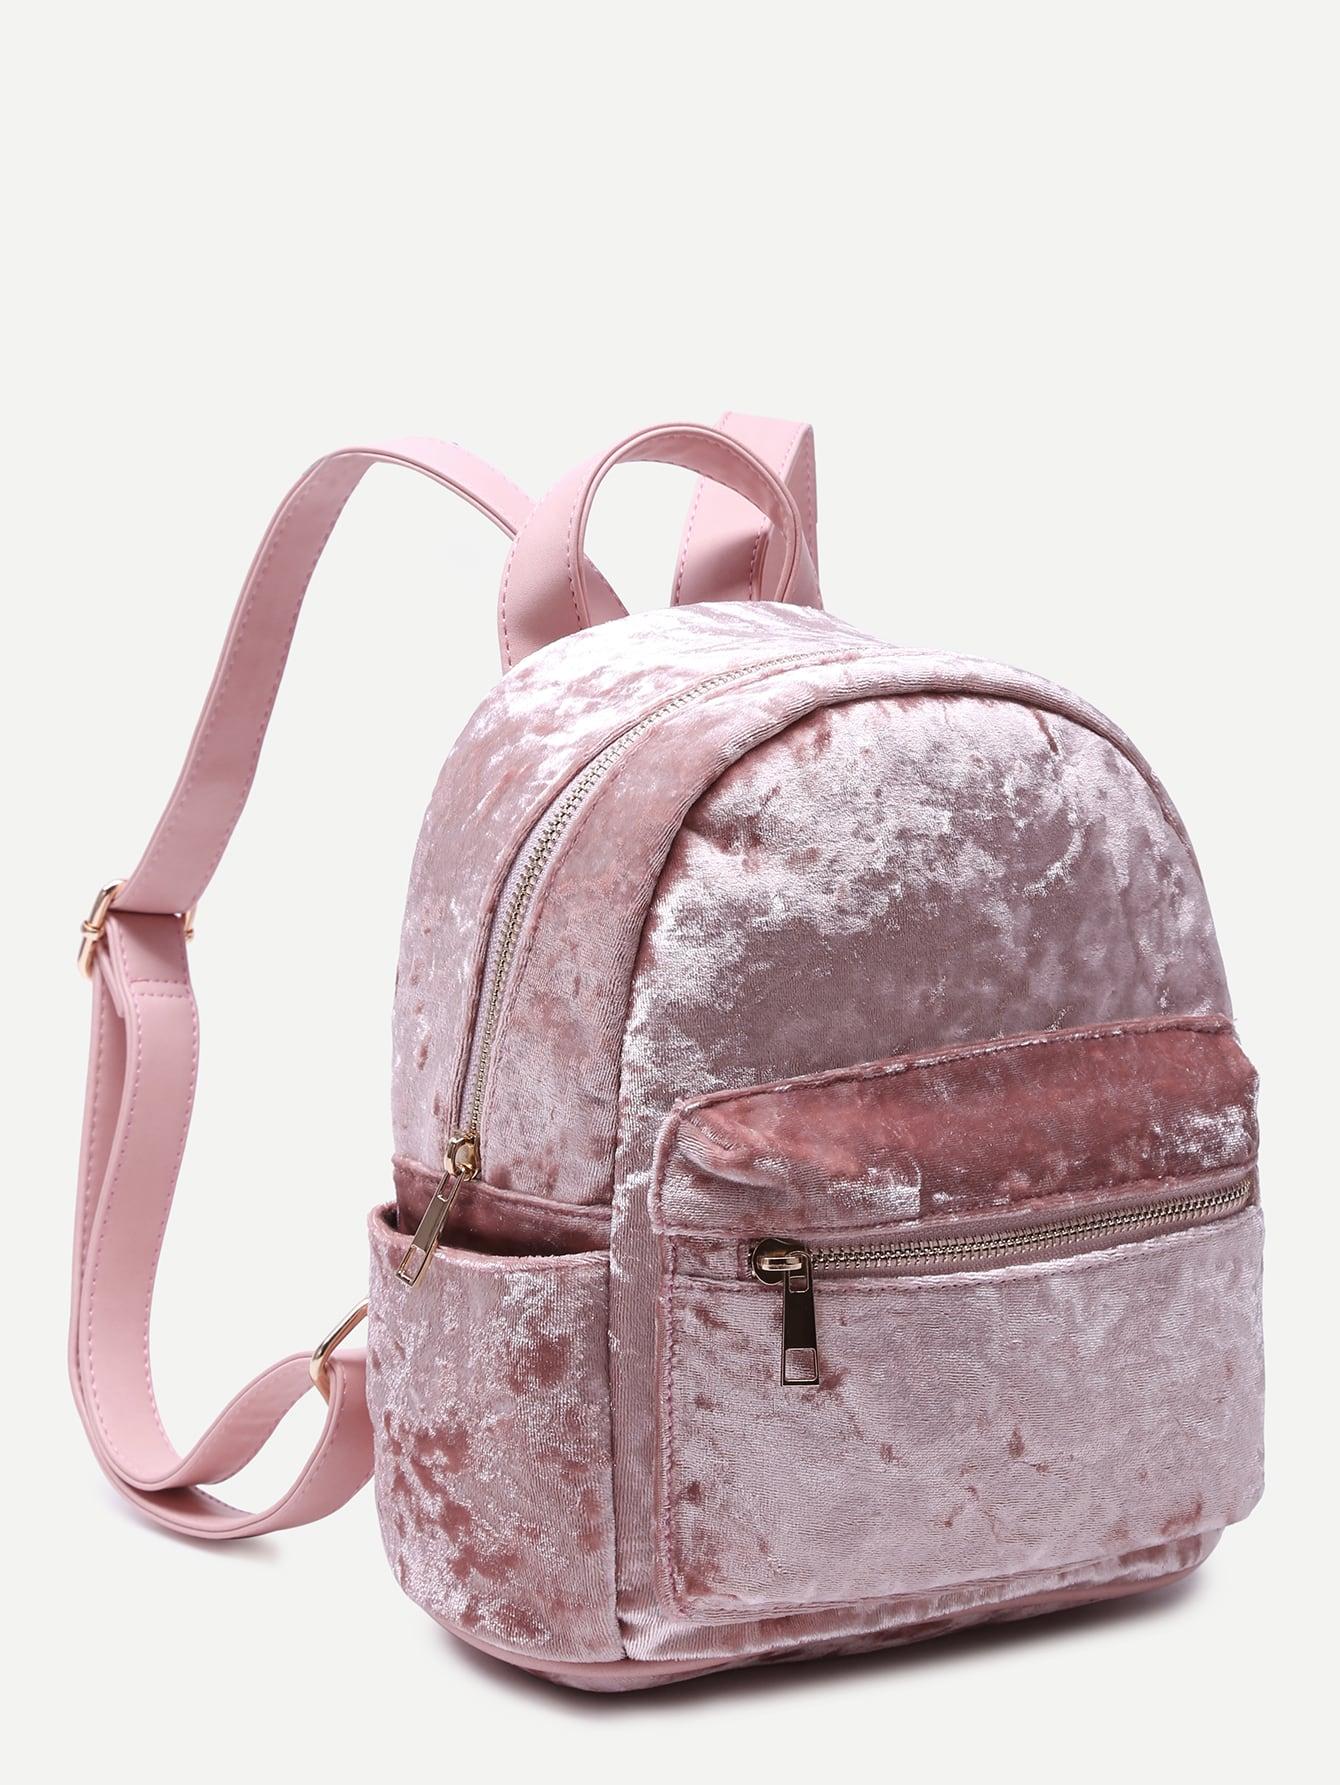 bag161122908_1